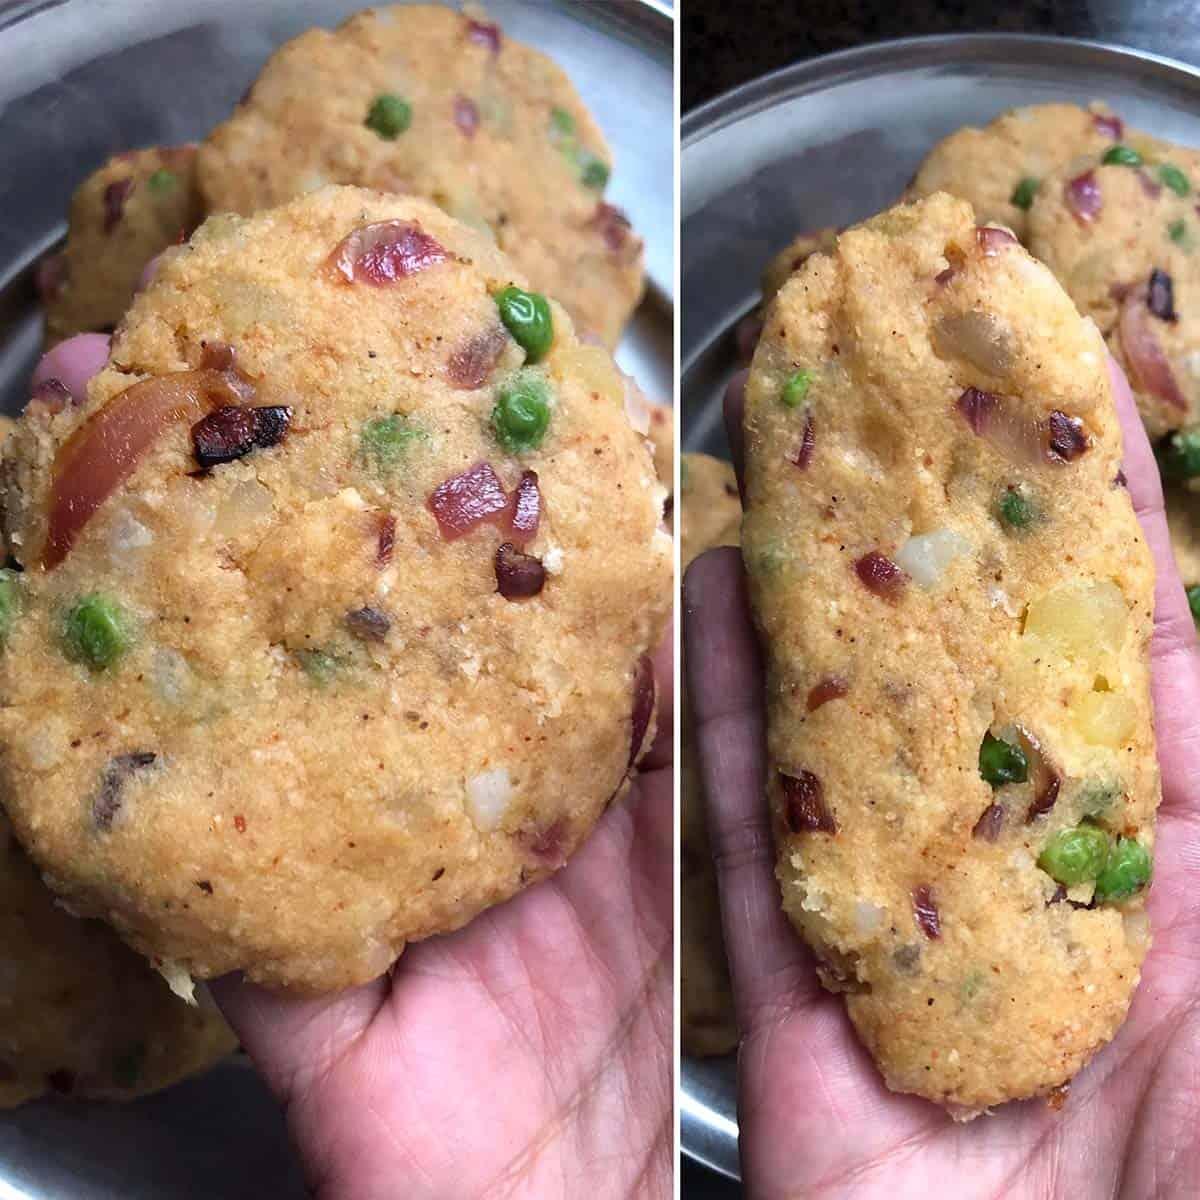 Shaping potato patties